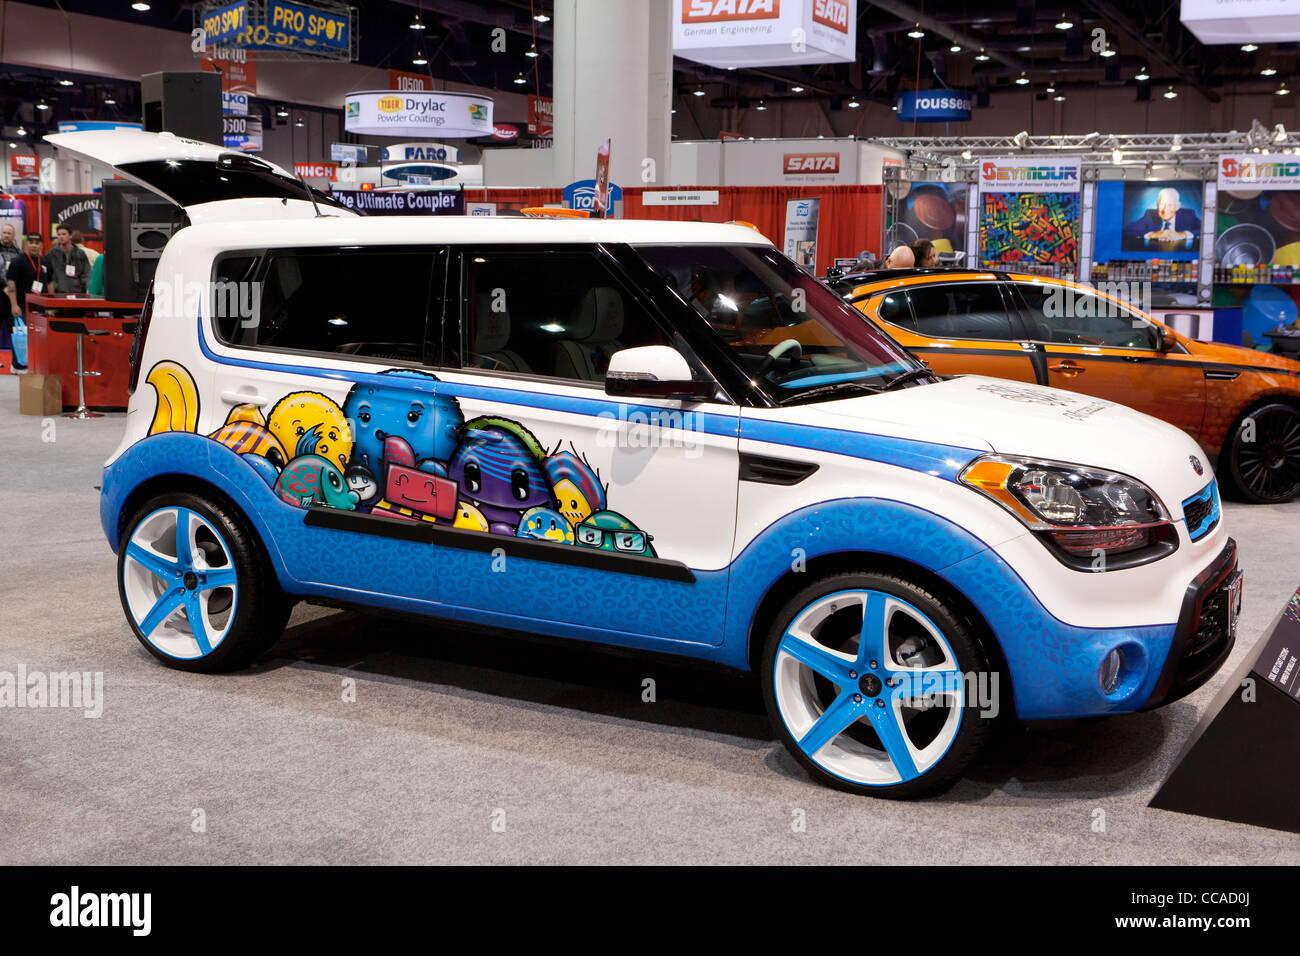 """Hoyo en Uno"" - Kia Soul Kia concept car inspirado por Michelle Wie Imagen De Stock"